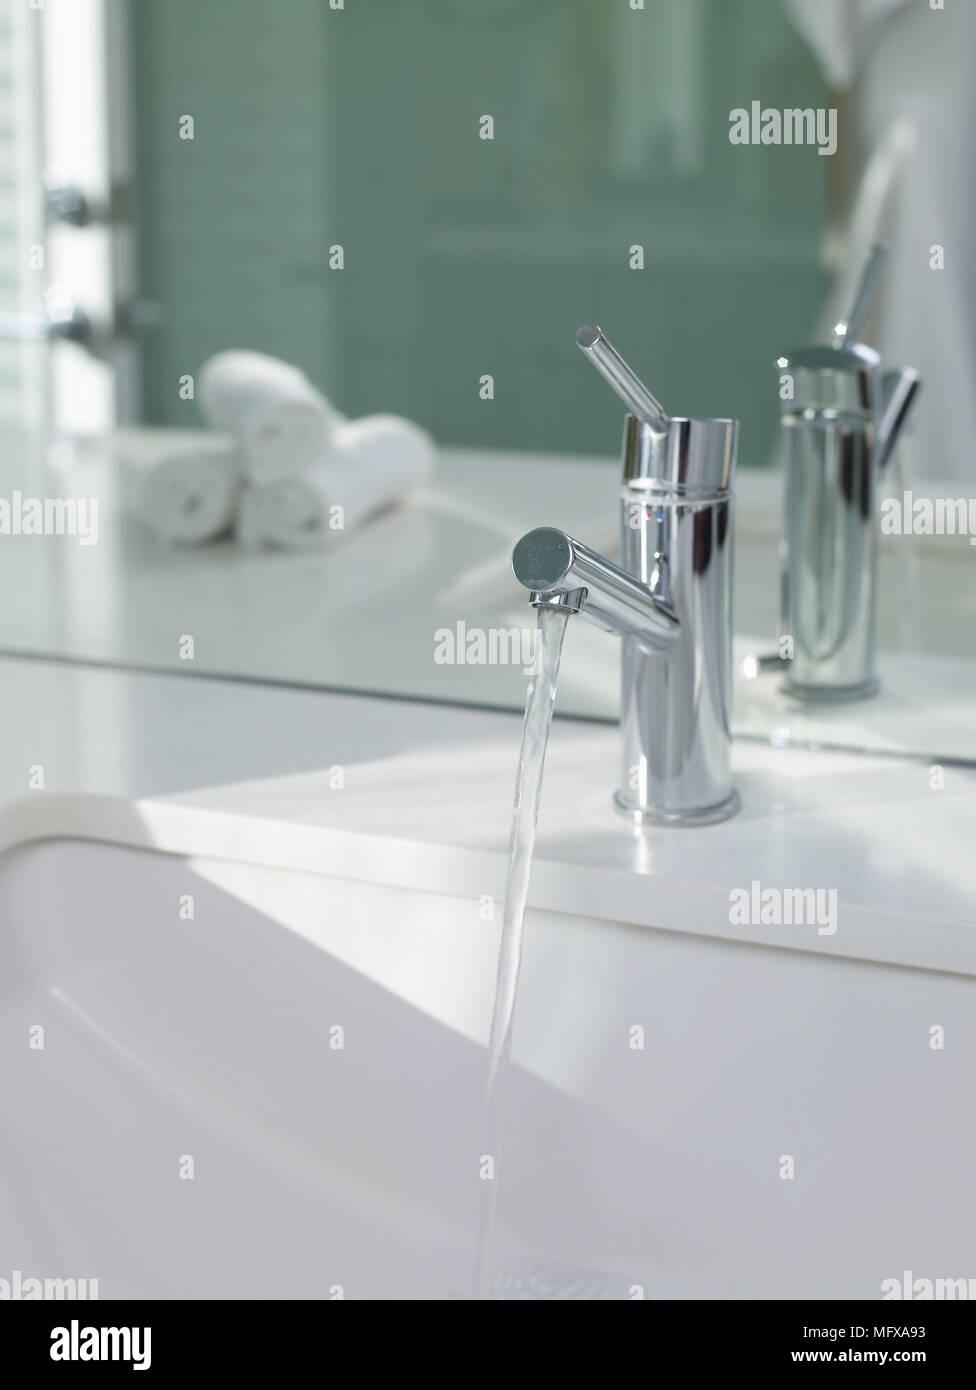 Colocacion Lavabo.Agua Corriente Del Grifo De Cromo Sobre Colocacion De Lavabo